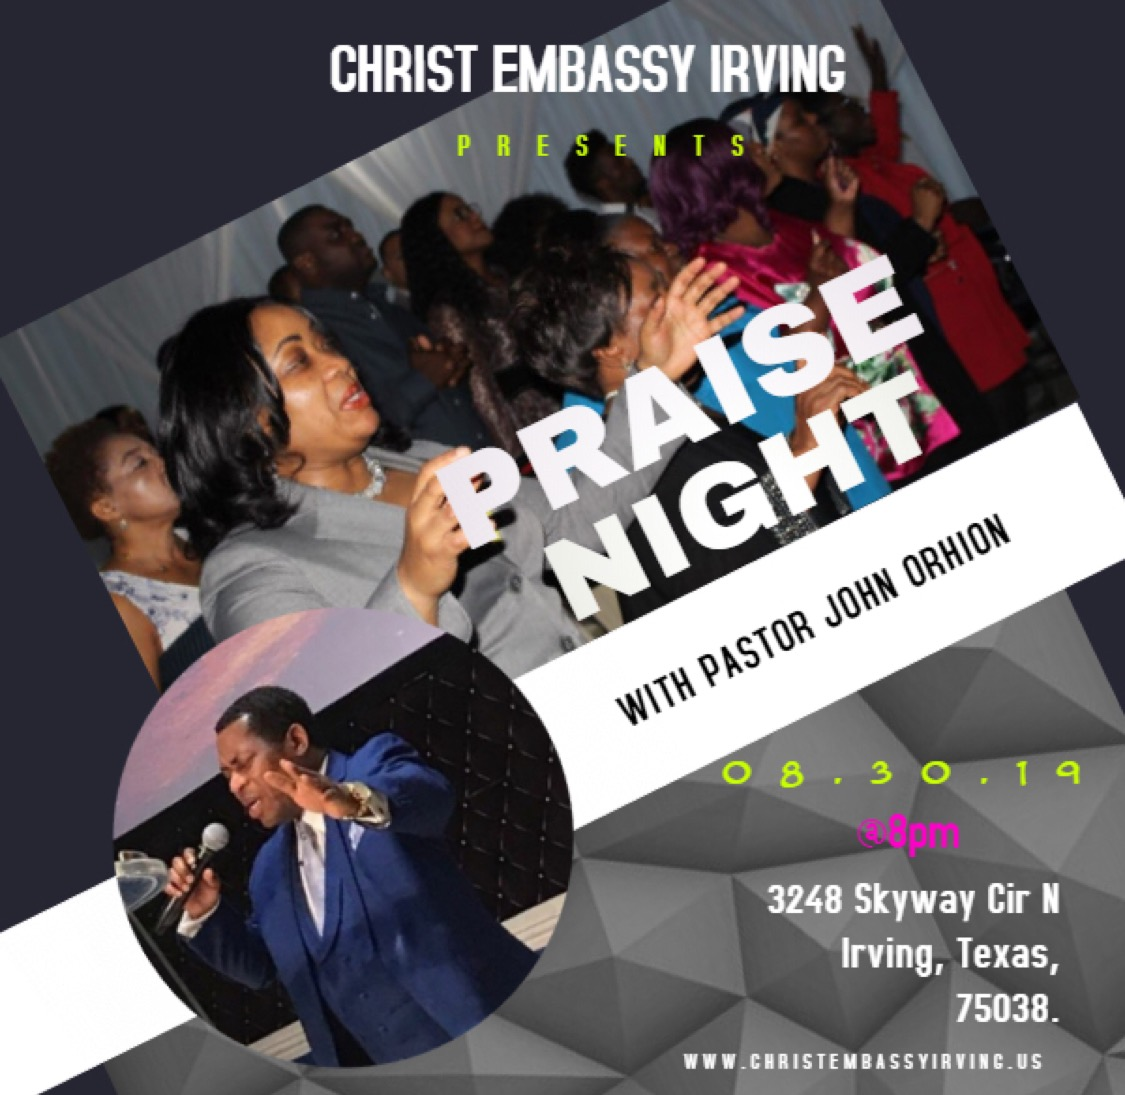 Praise Night with Pastor John